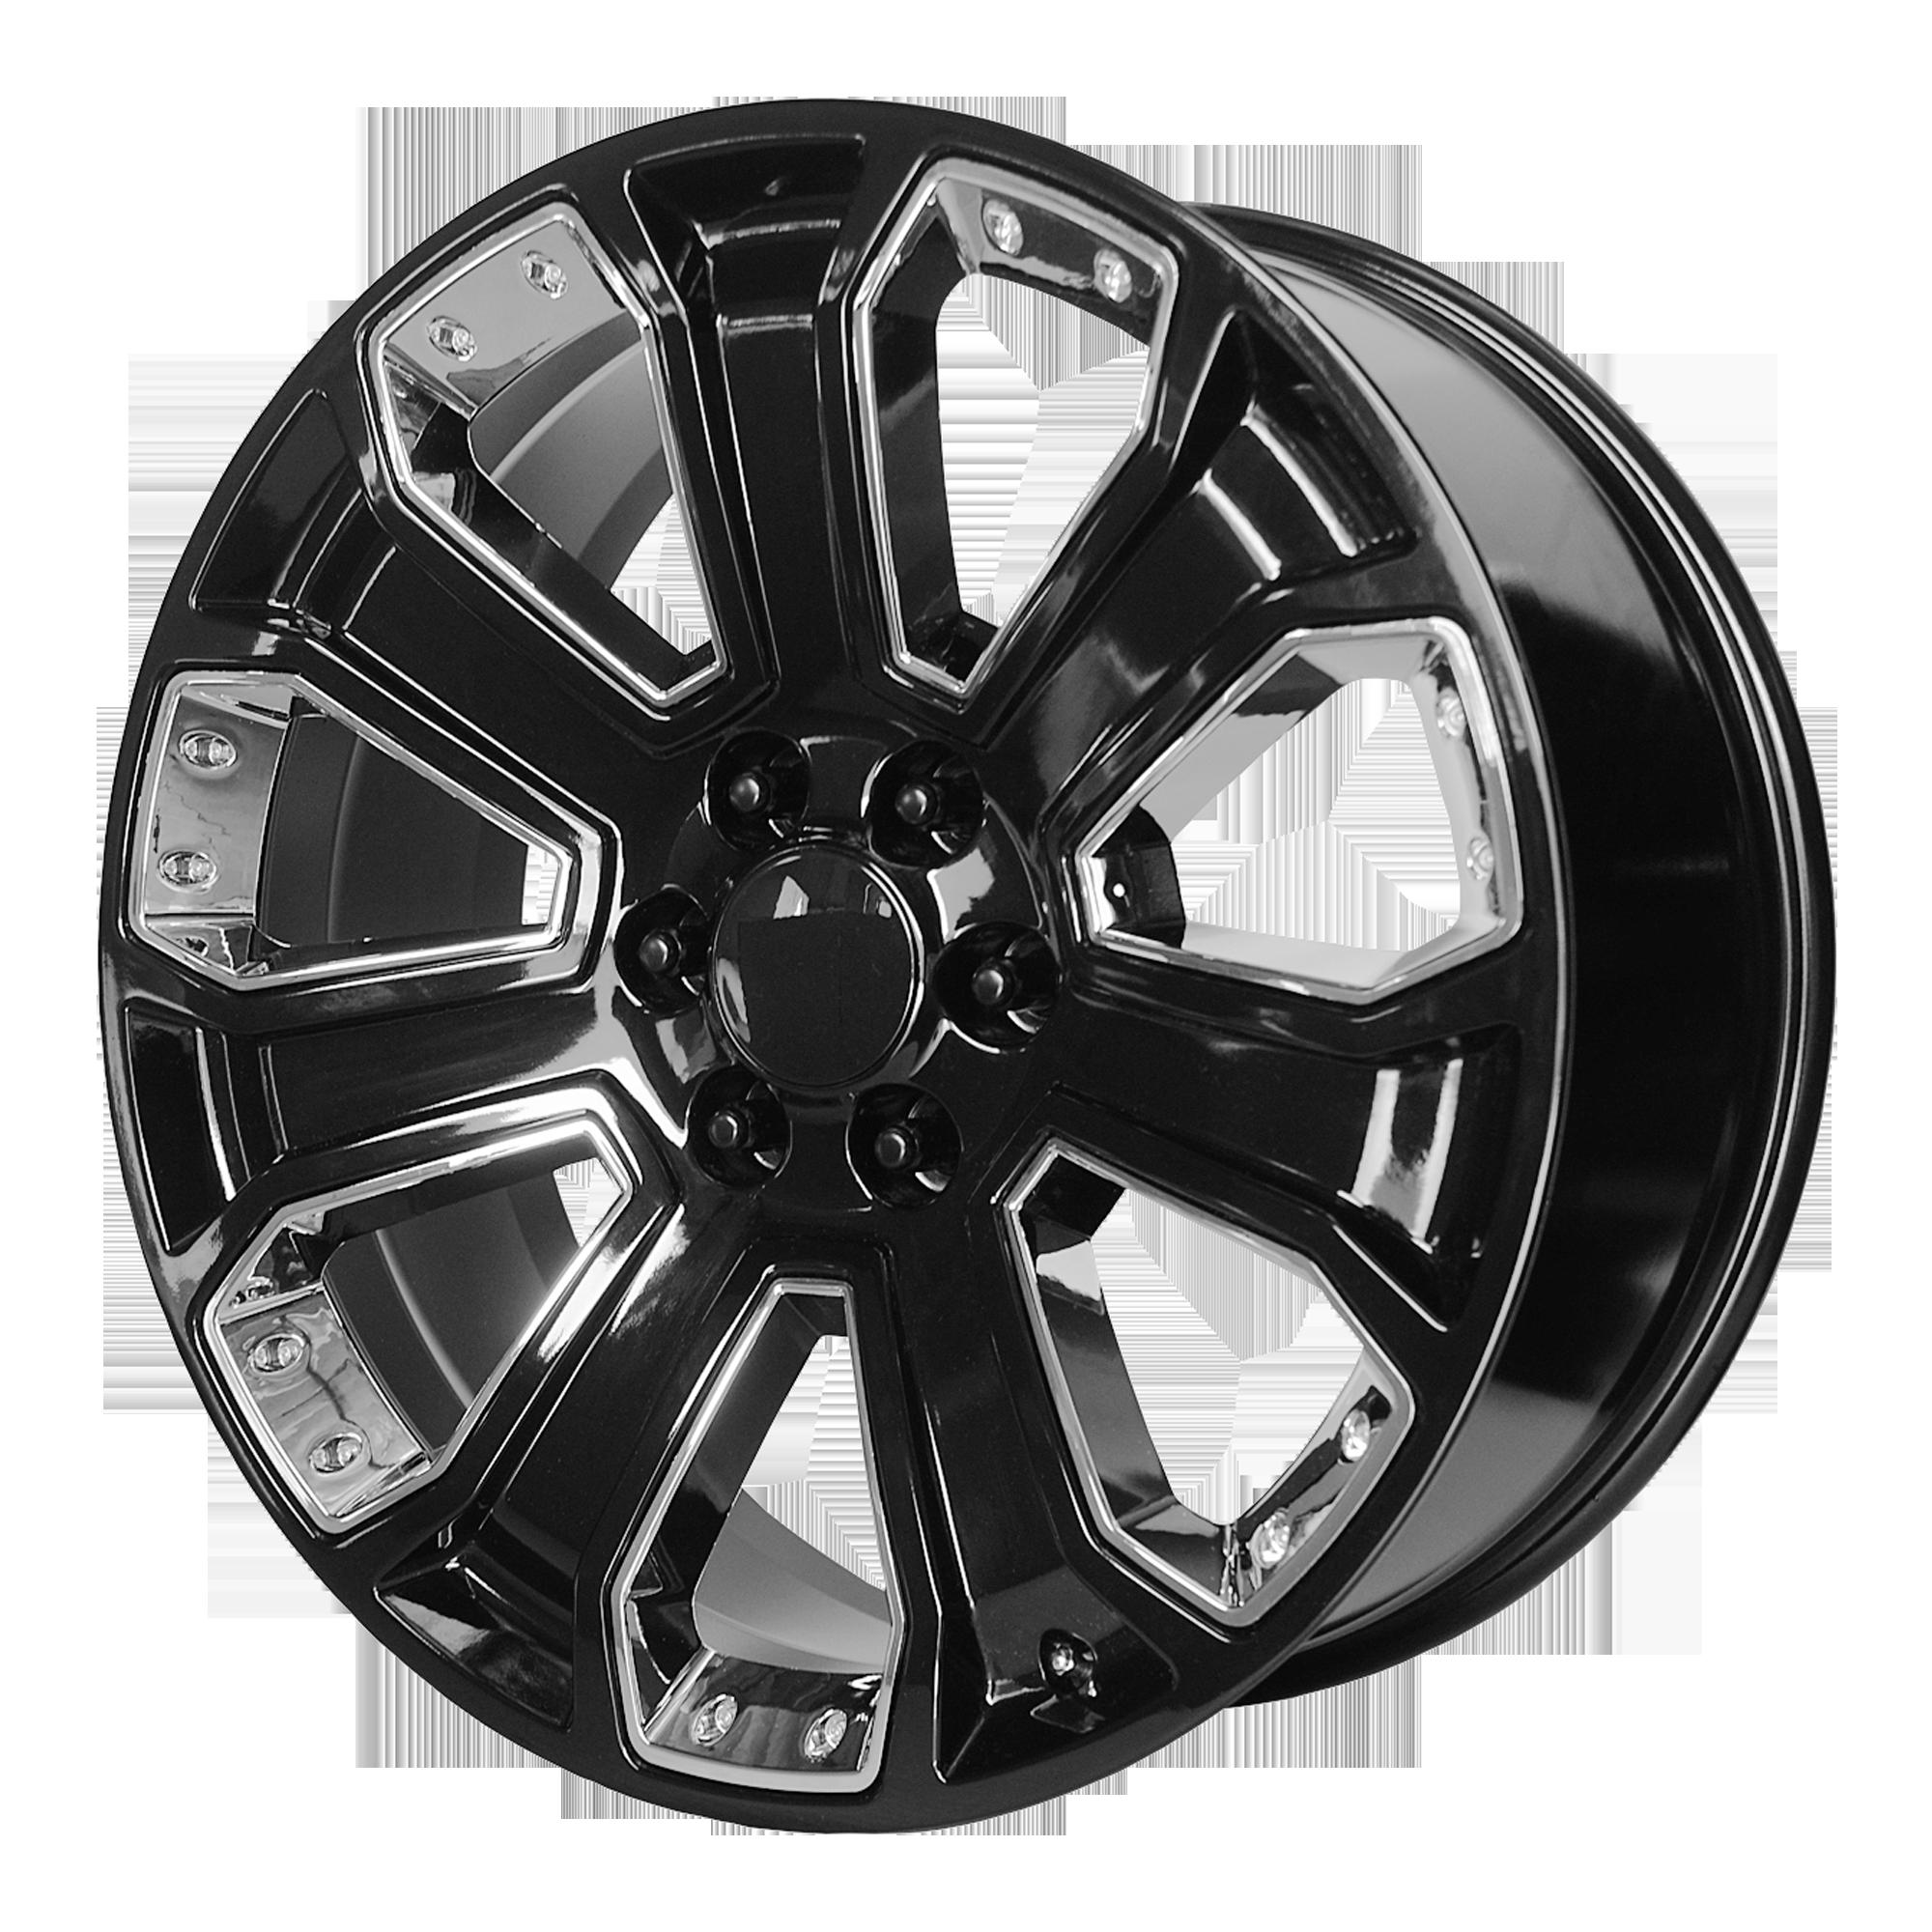 OE Creations Replica Wheels OE Creations PR162 Gloss Black w/ CHR Accents